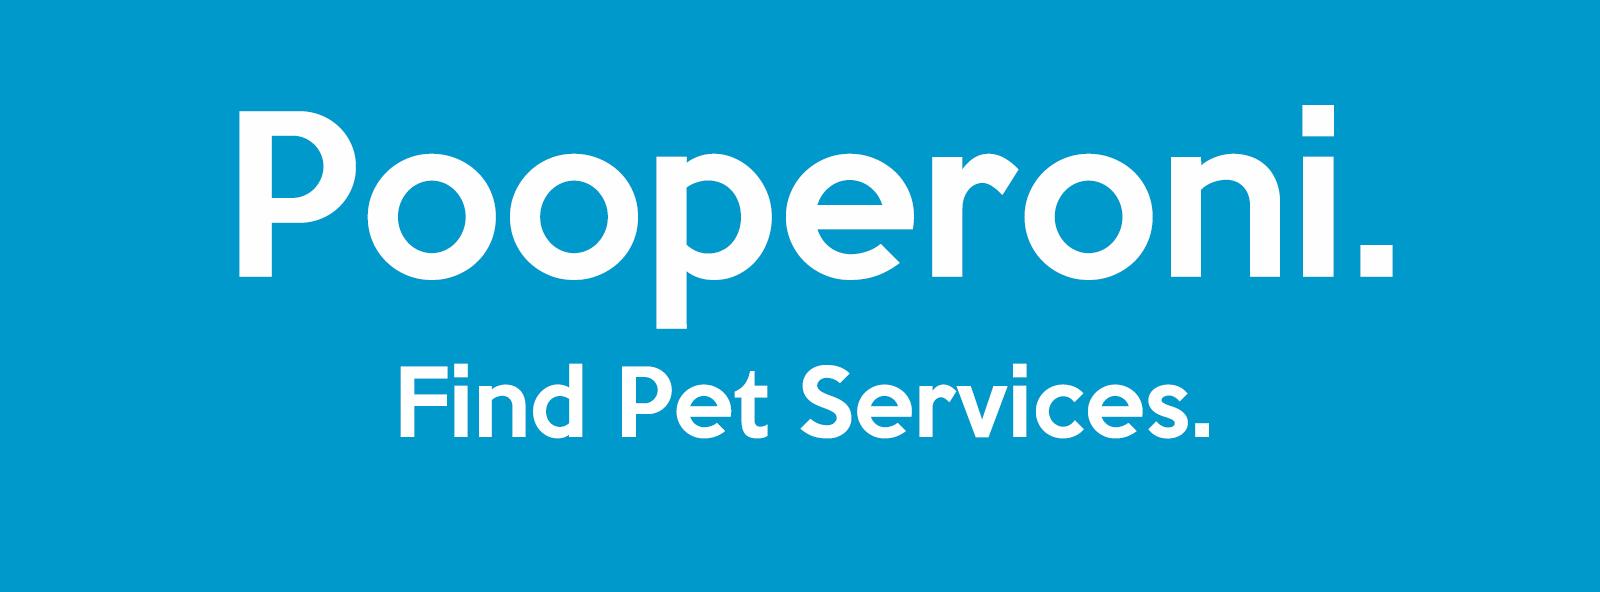 dog poop cleanup and dog poop removal services